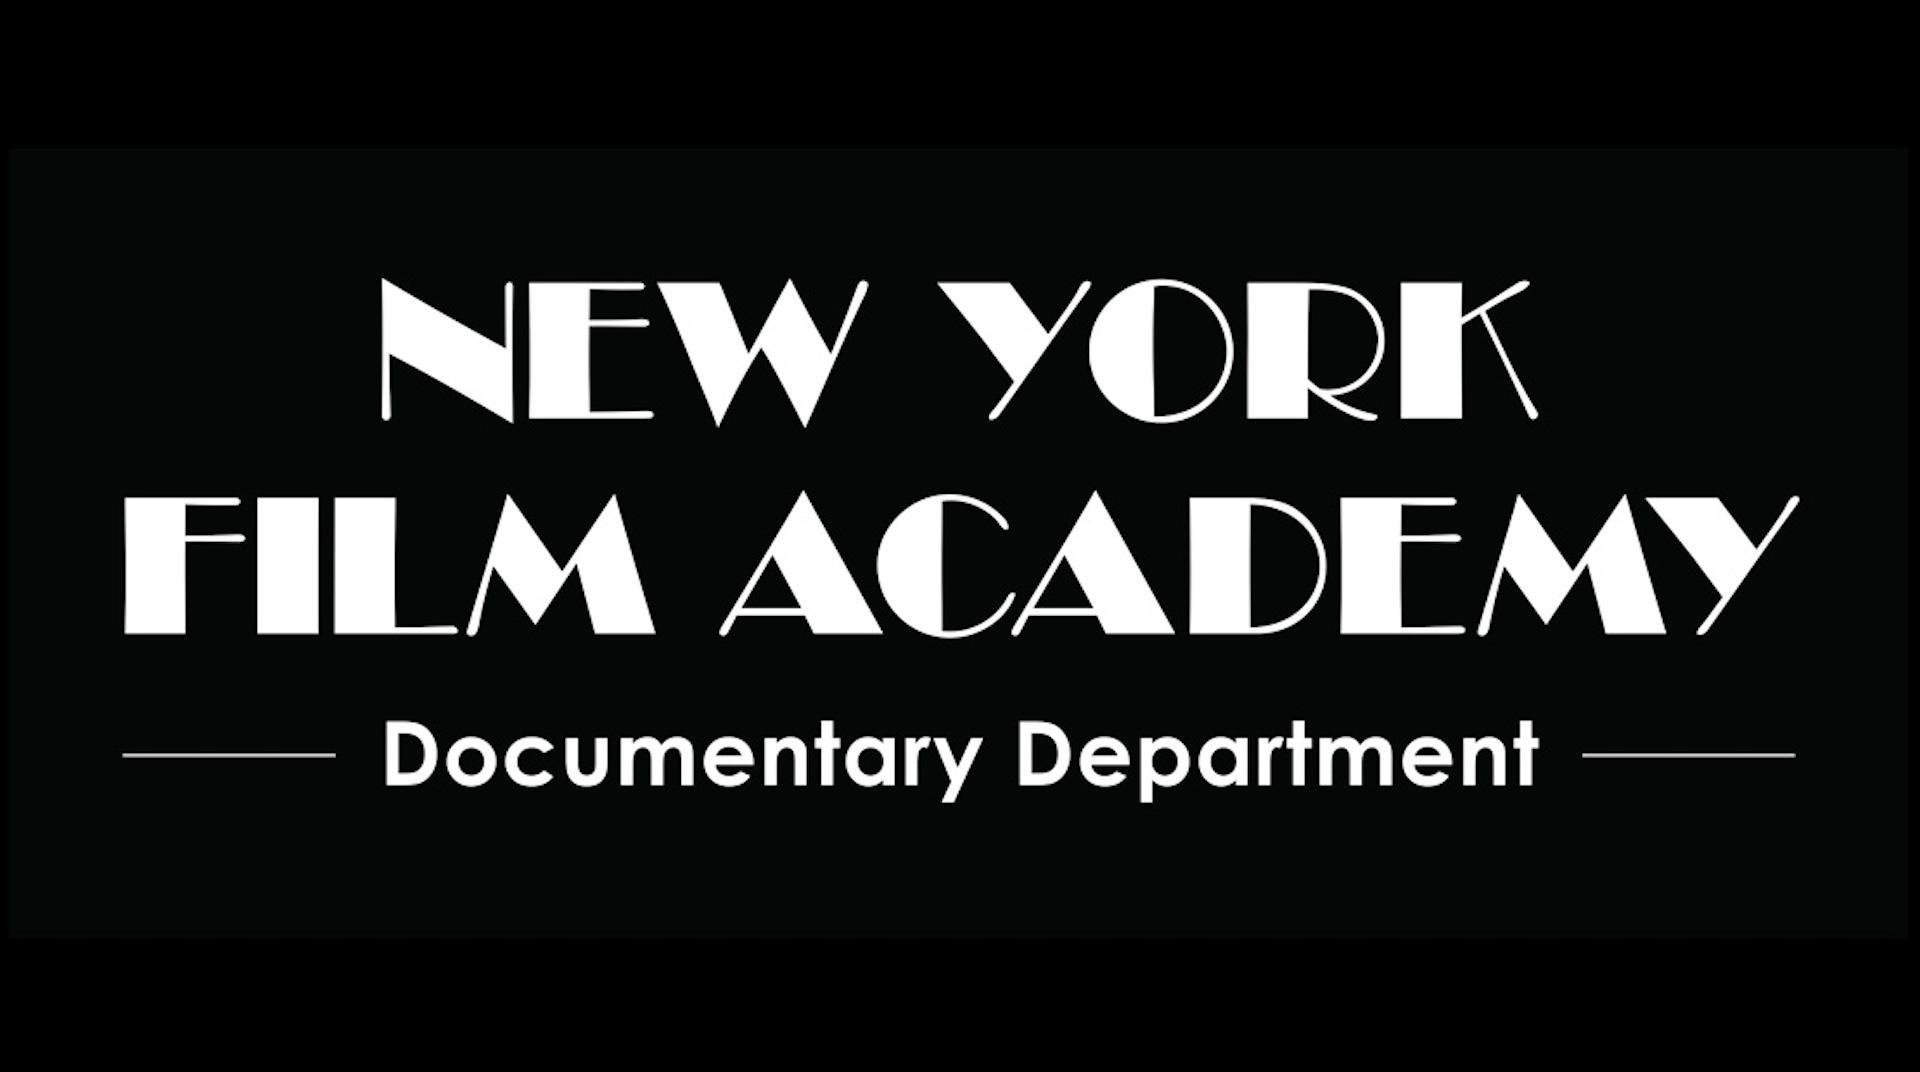 DOC NYC U: NEW YORK FILM ACADEMY SHOWCASE